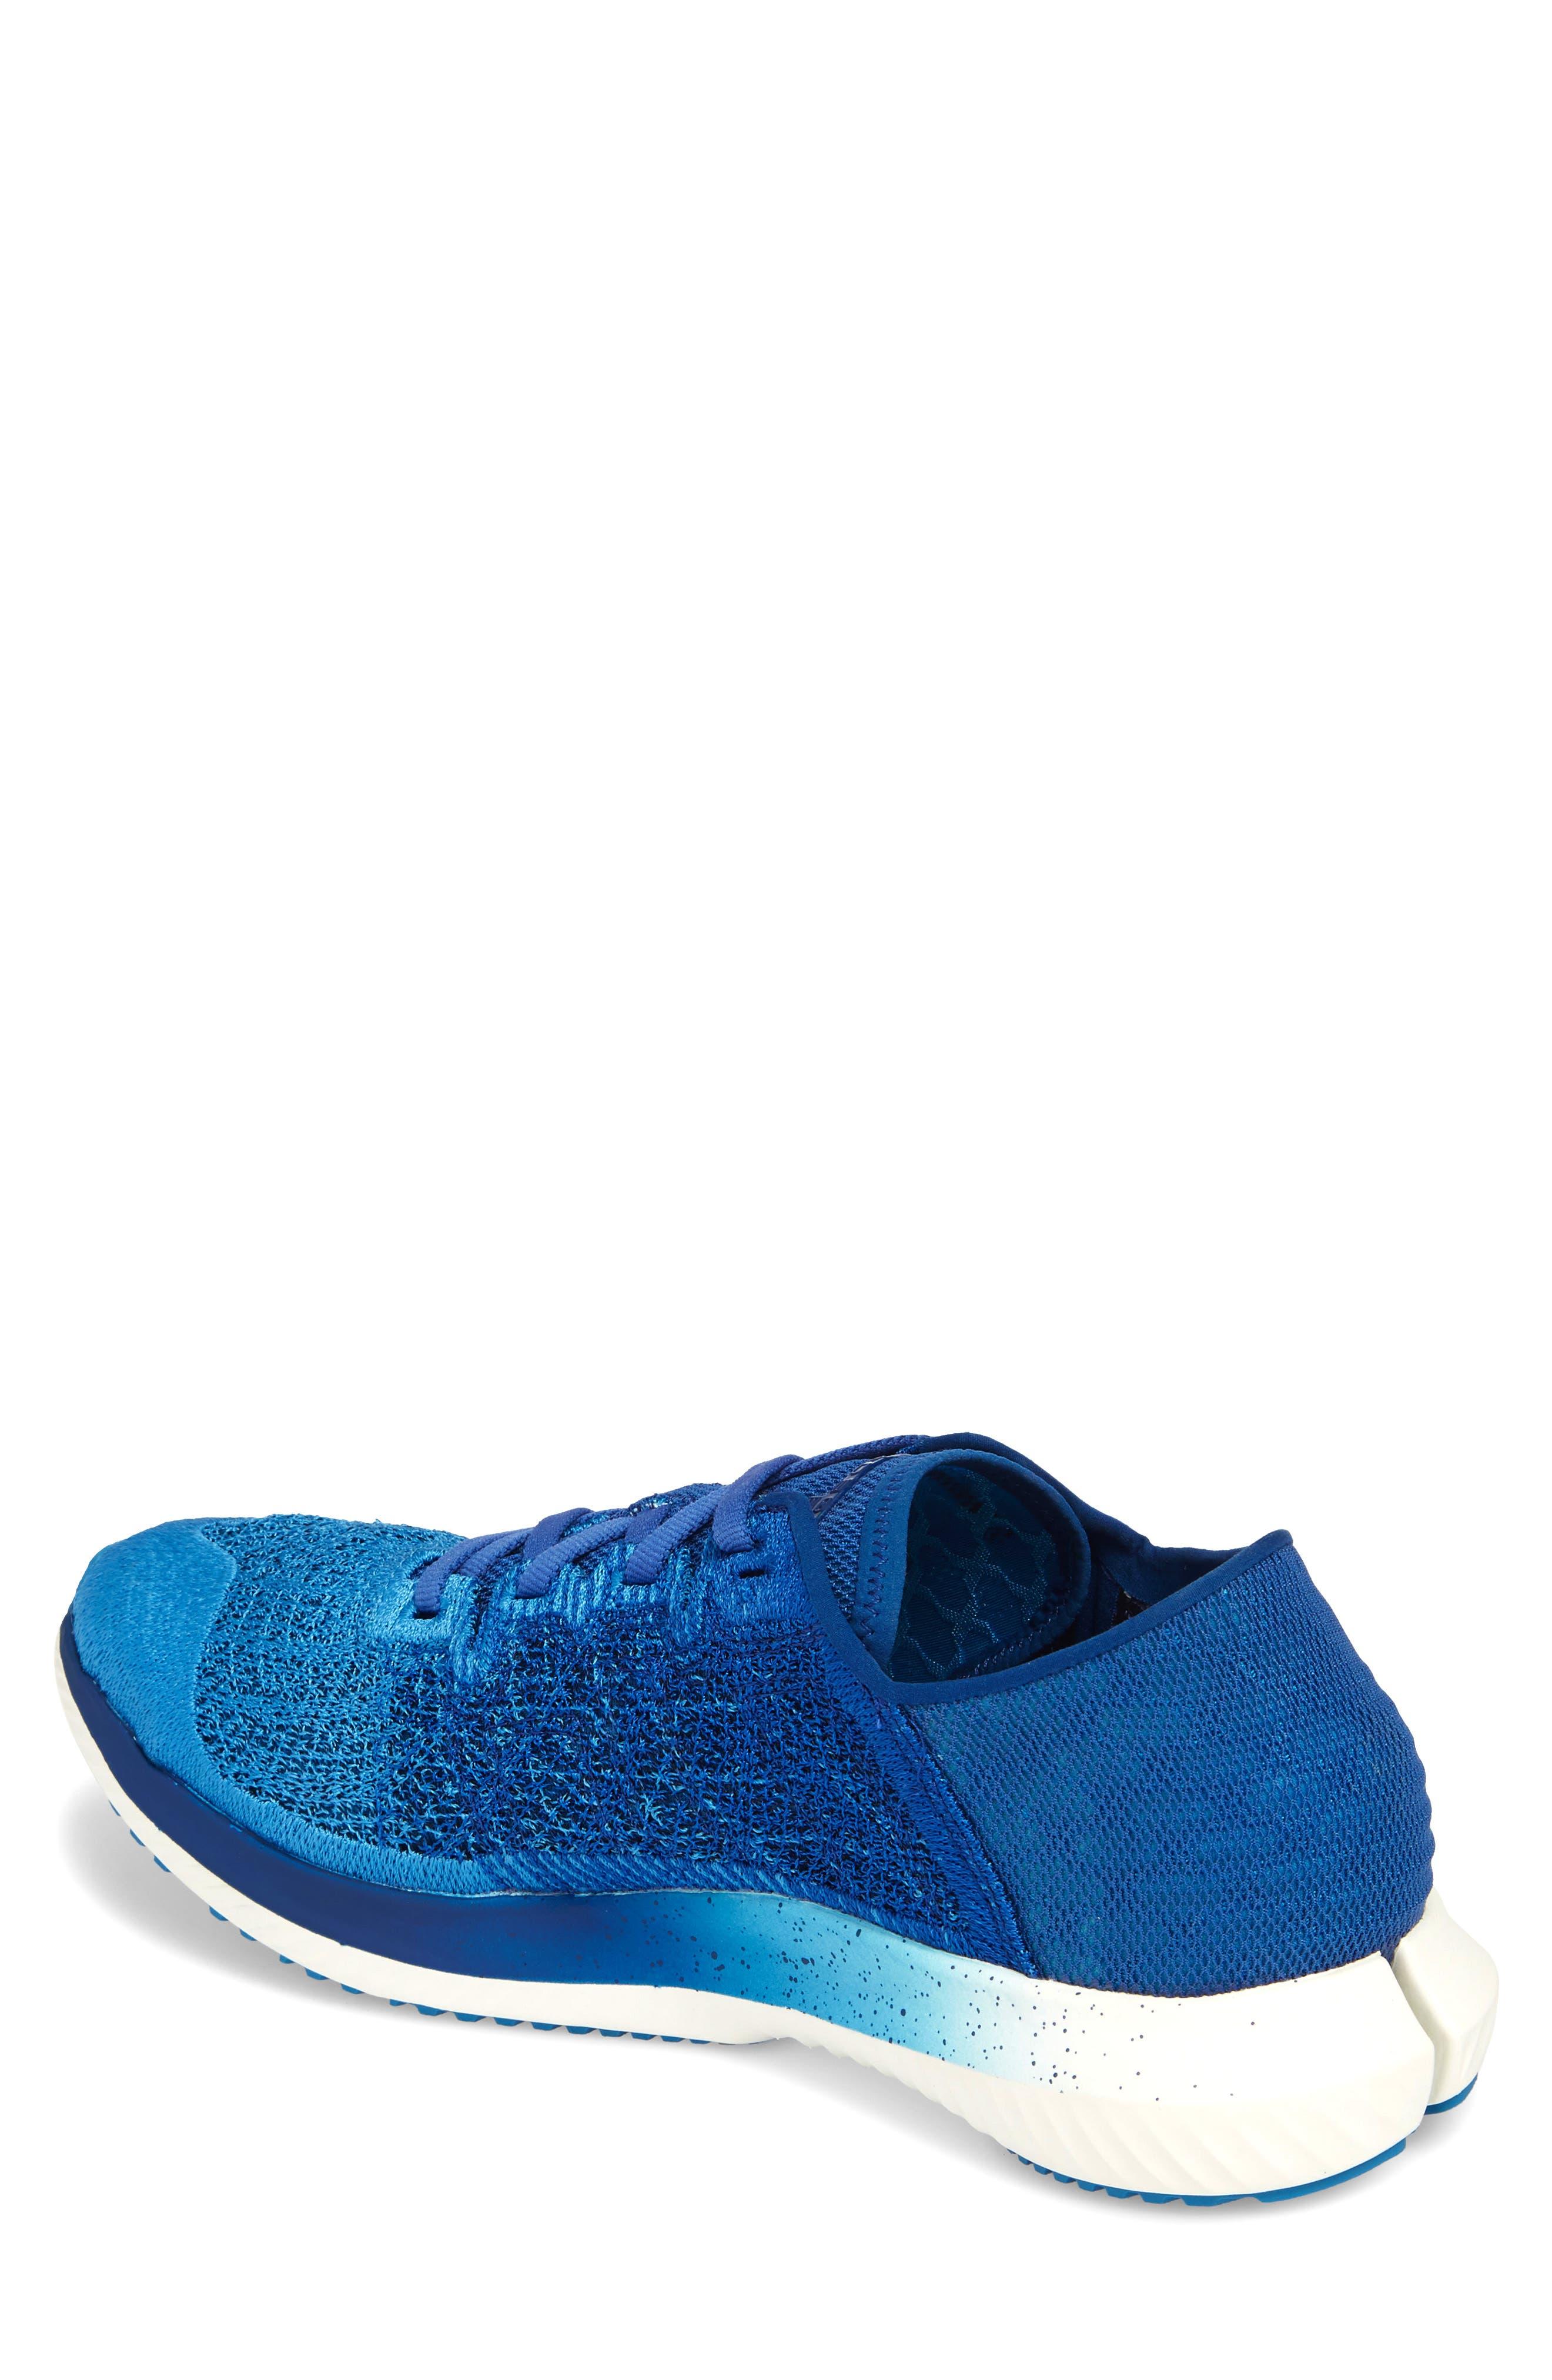 UNDER ARMOUR,                             Threadborne Blur Running Shoe,                             Alternate thumbnail 2, color,                             400